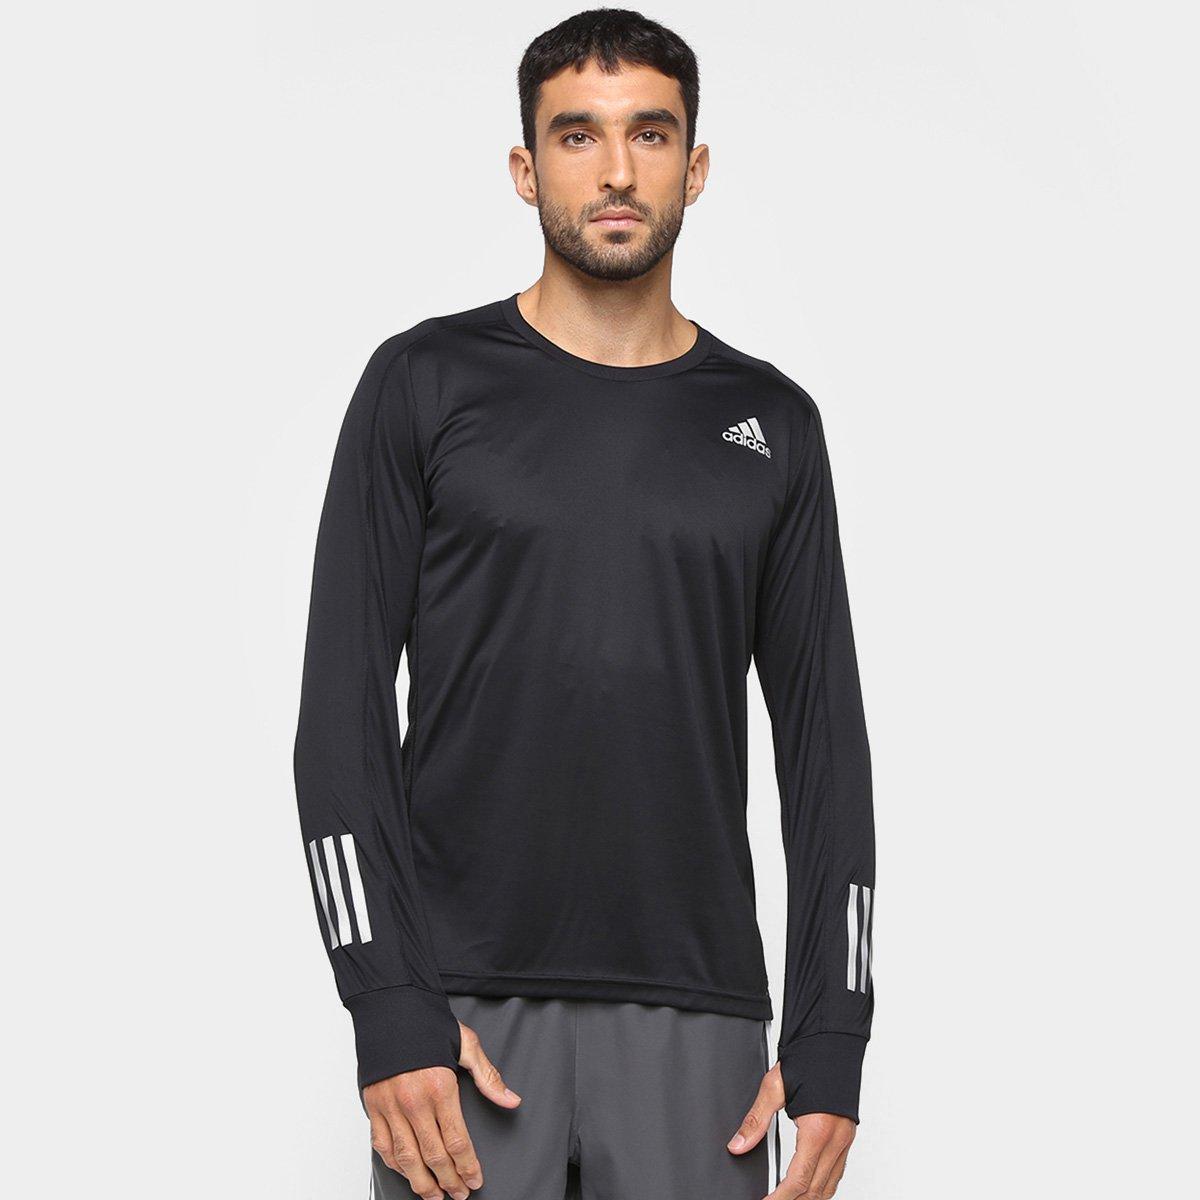 Camiseta Adidas Own The Run Manga Longa Masculina